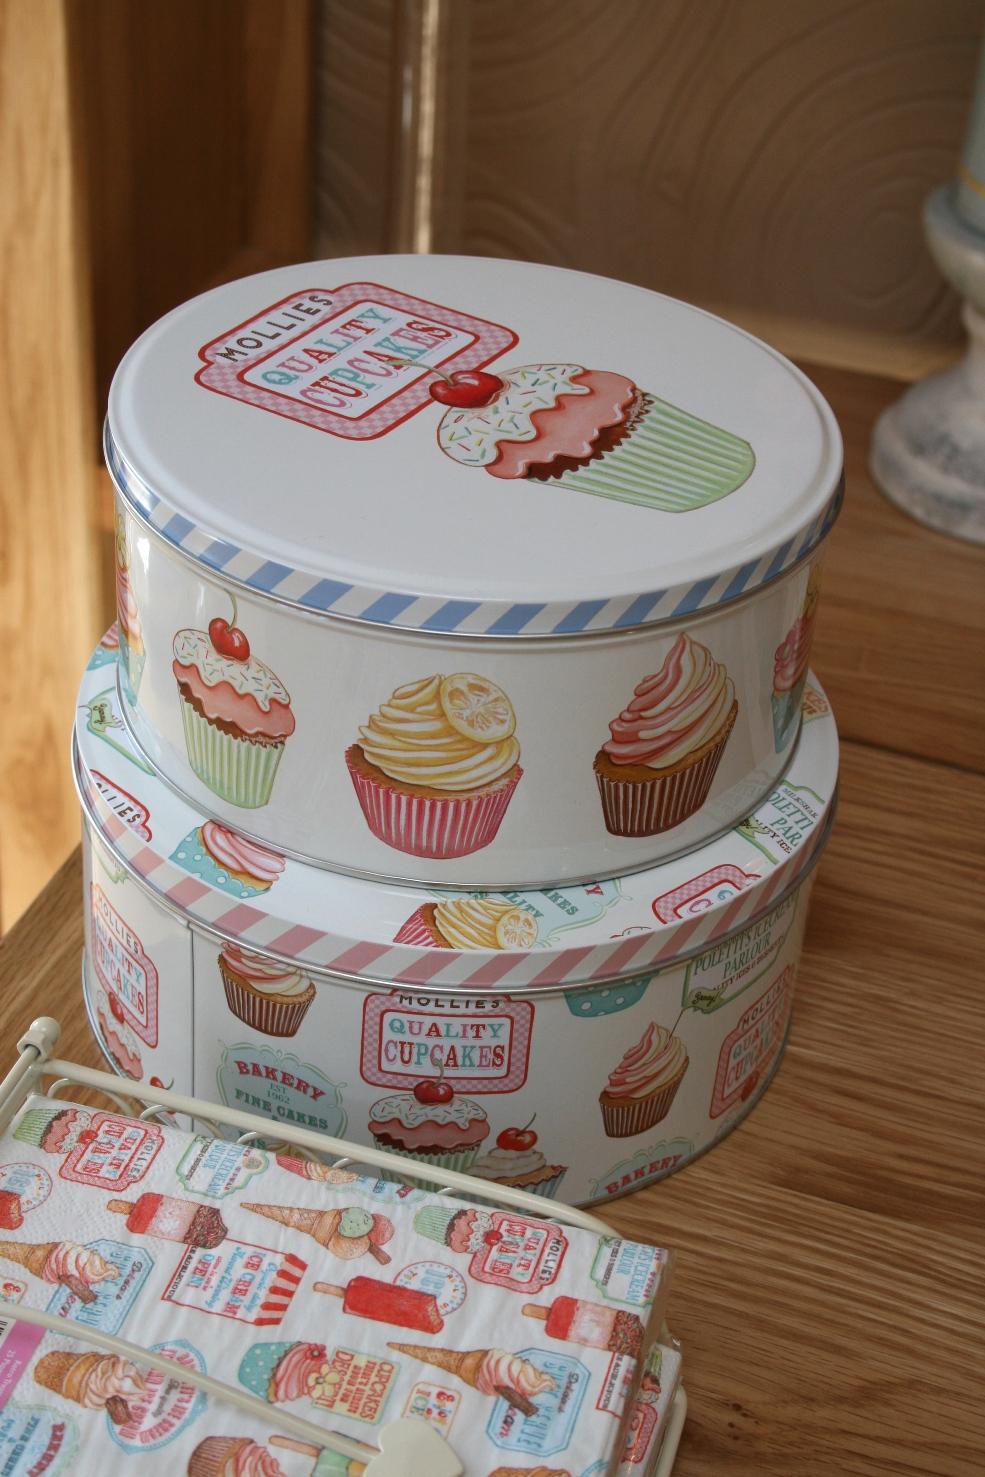 Set Of 2 Cake Tins CRT-5130524 - €19.00